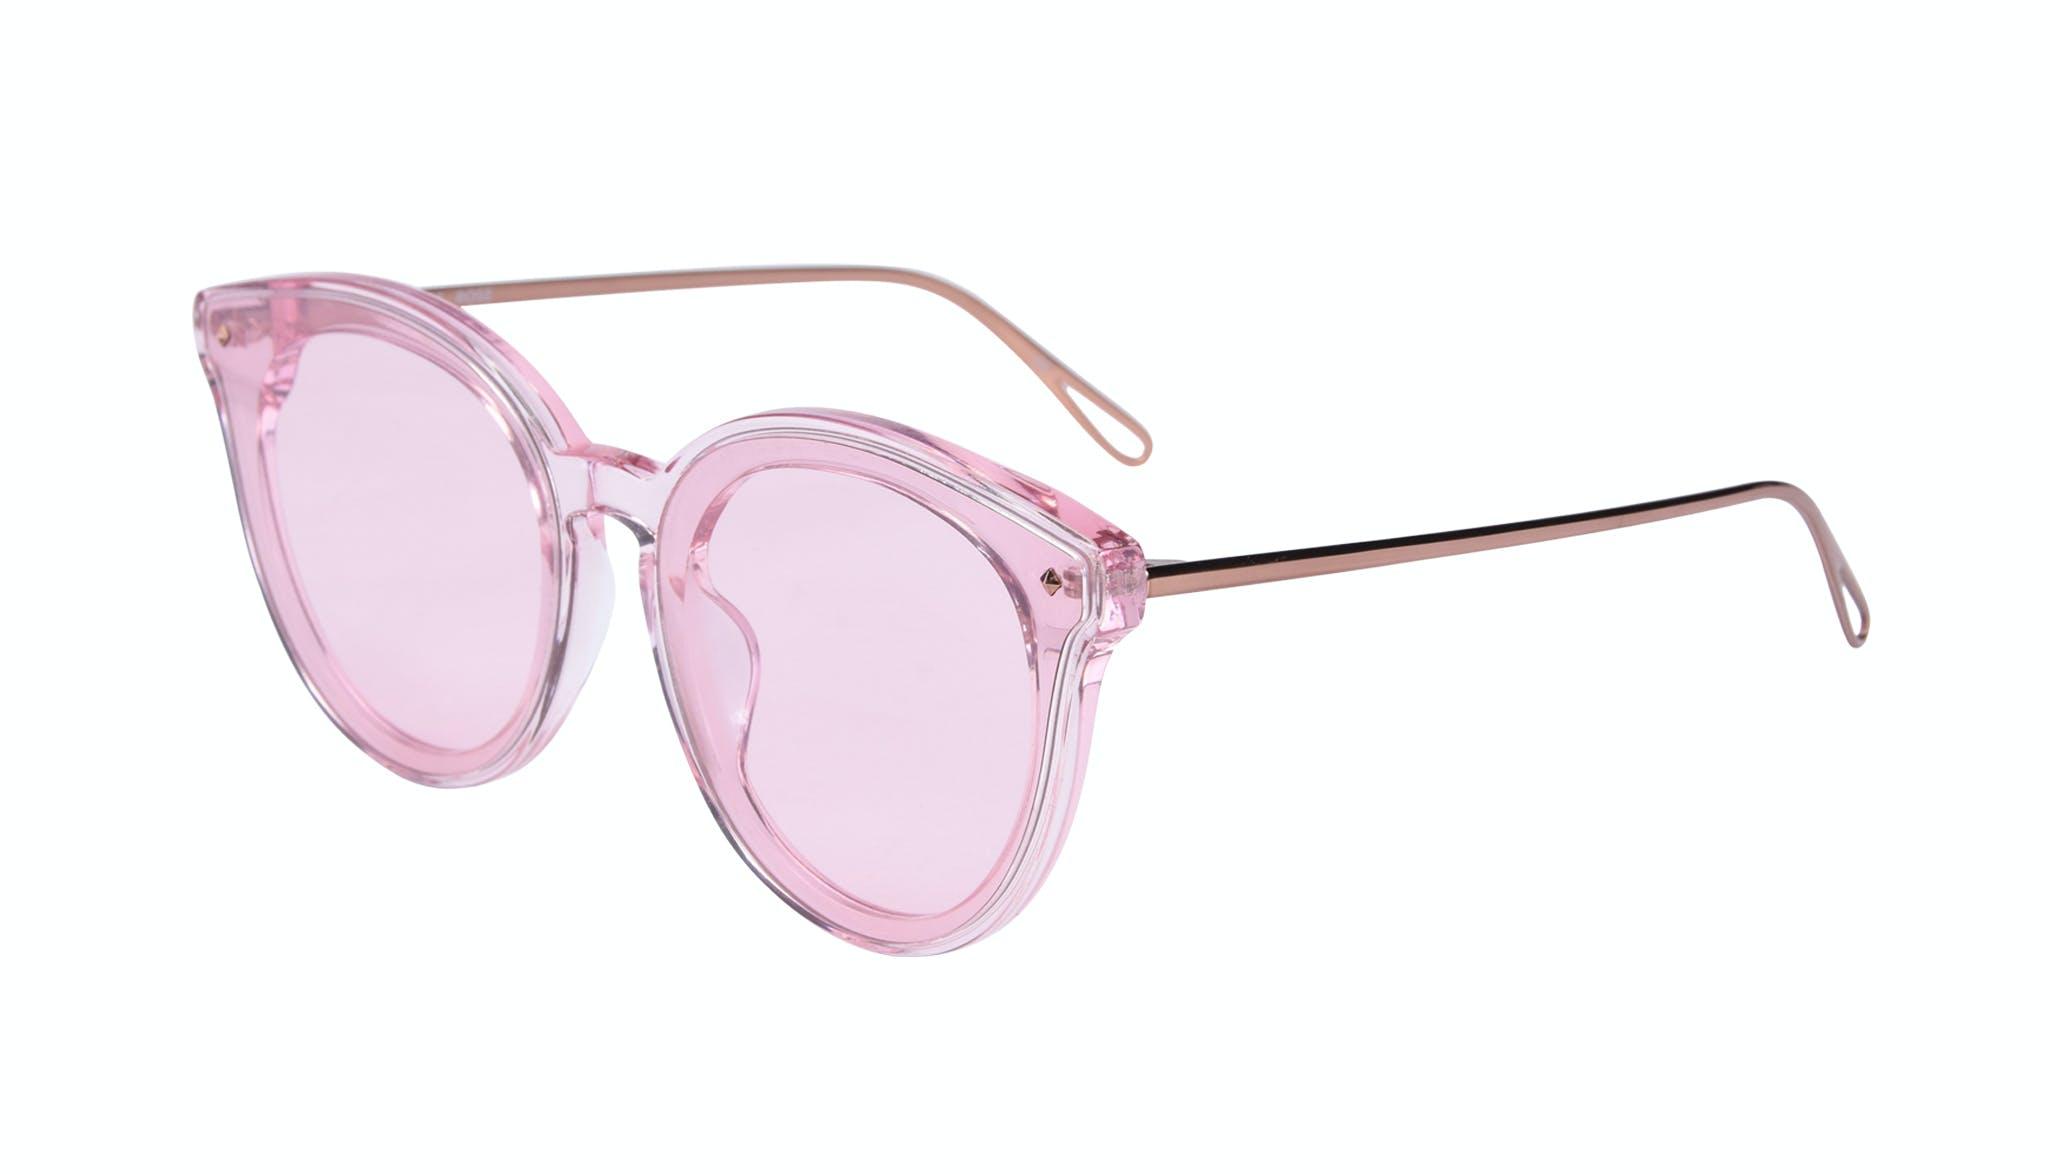 Affordable Fashion Glasses Cat Eye Sunglasses Women Icone Rose Tilt